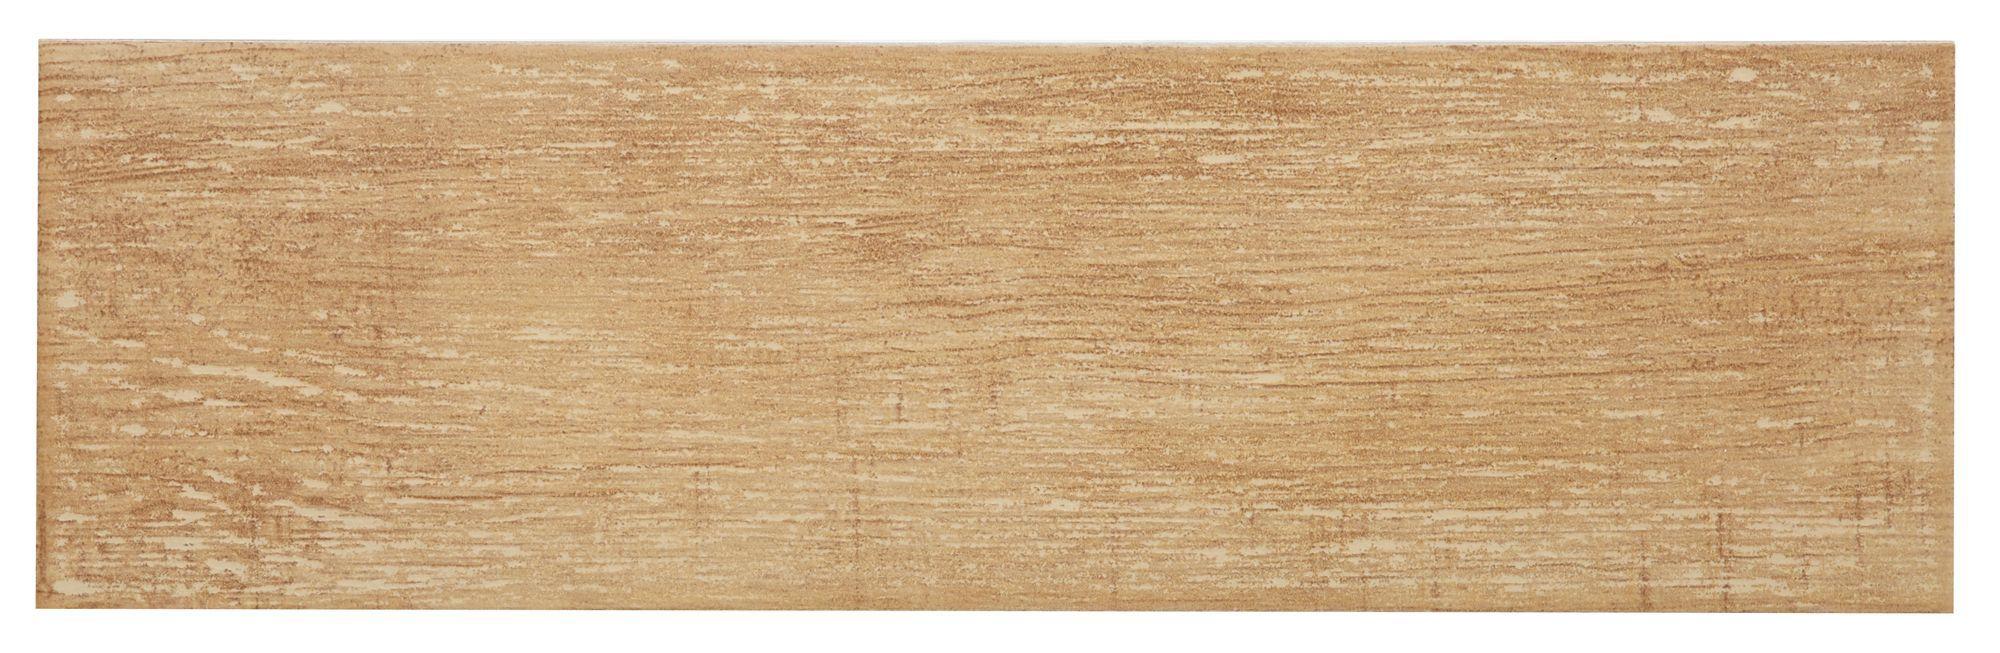 Organik honey oak effect ceramic wall floor tile pack of 13 l organik honey oak effect ceramic wall floor tile pack of 13 l500mm w150mm departments diy at bq dailygadgetfo Gallery